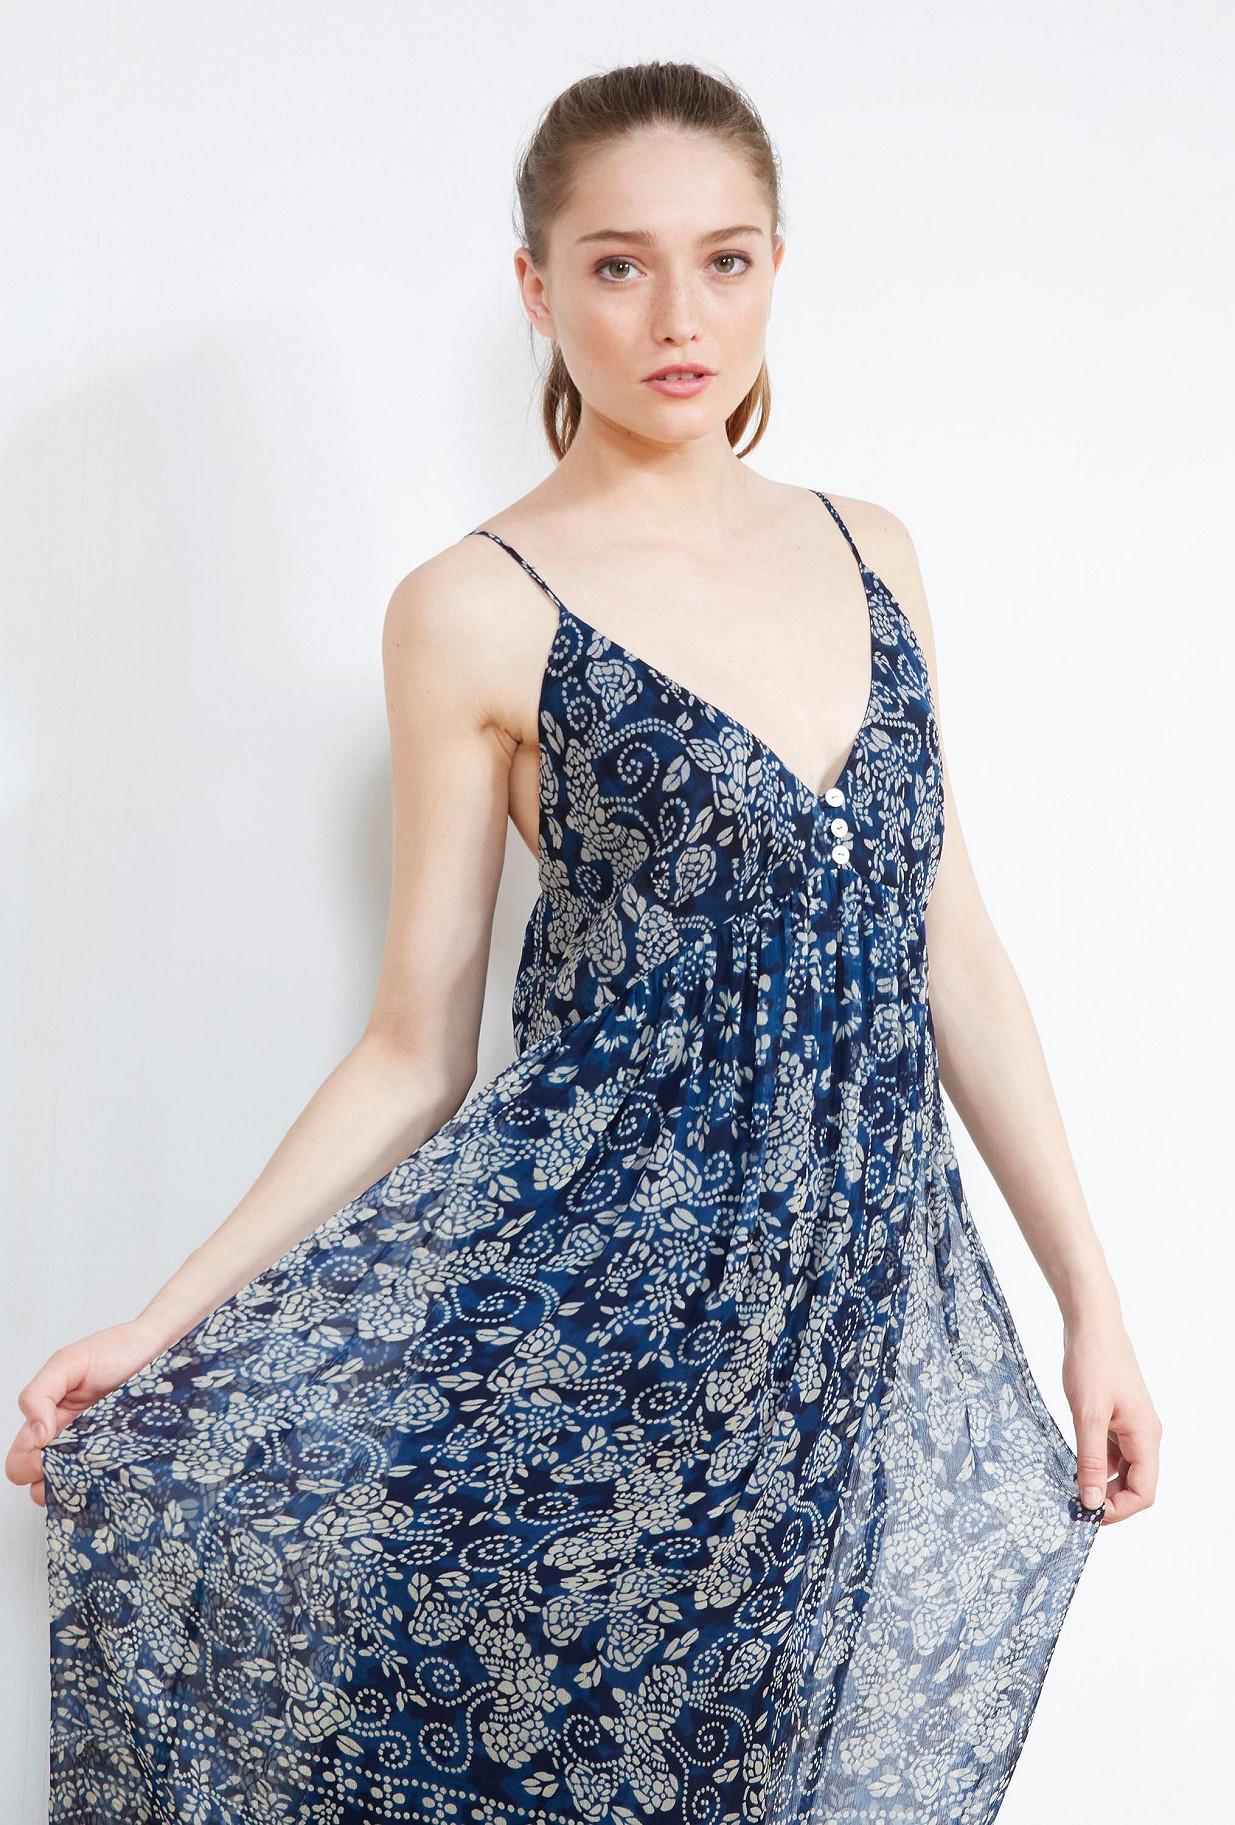 clothes store DRESS  Barathi french designer fashion Paris